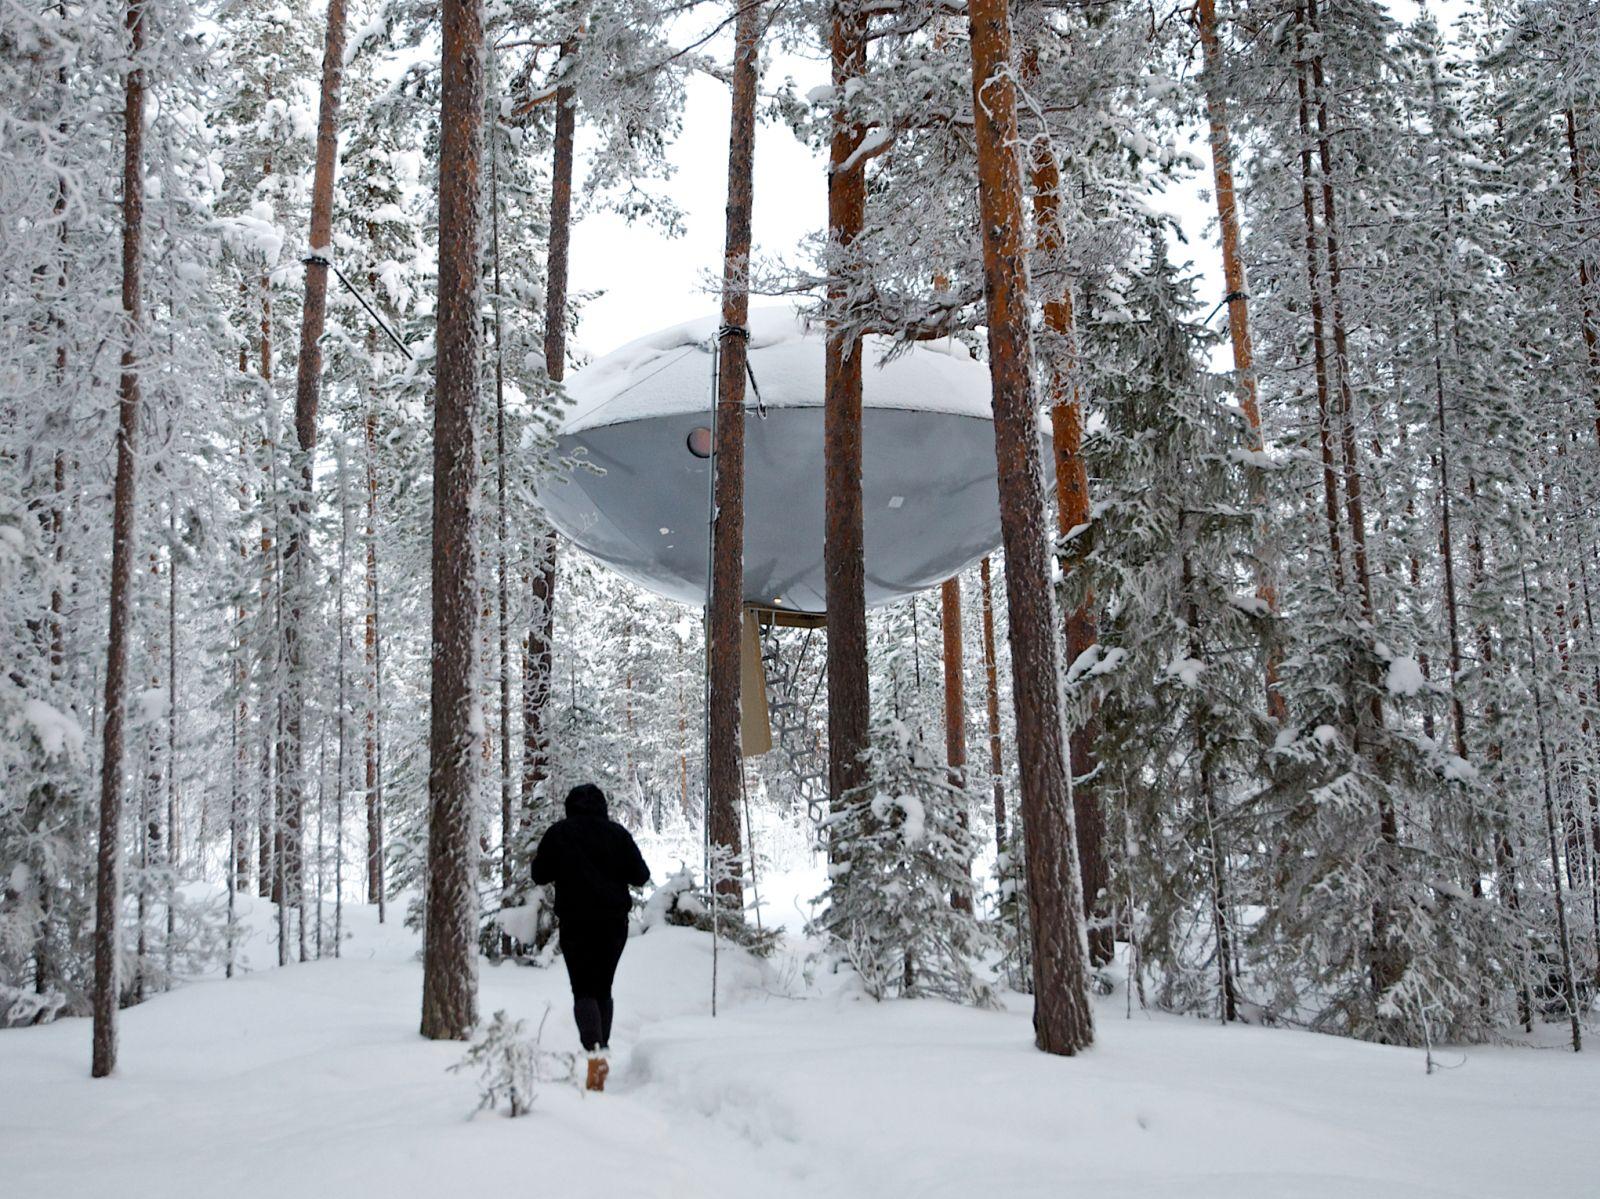 UFO Treehotel!